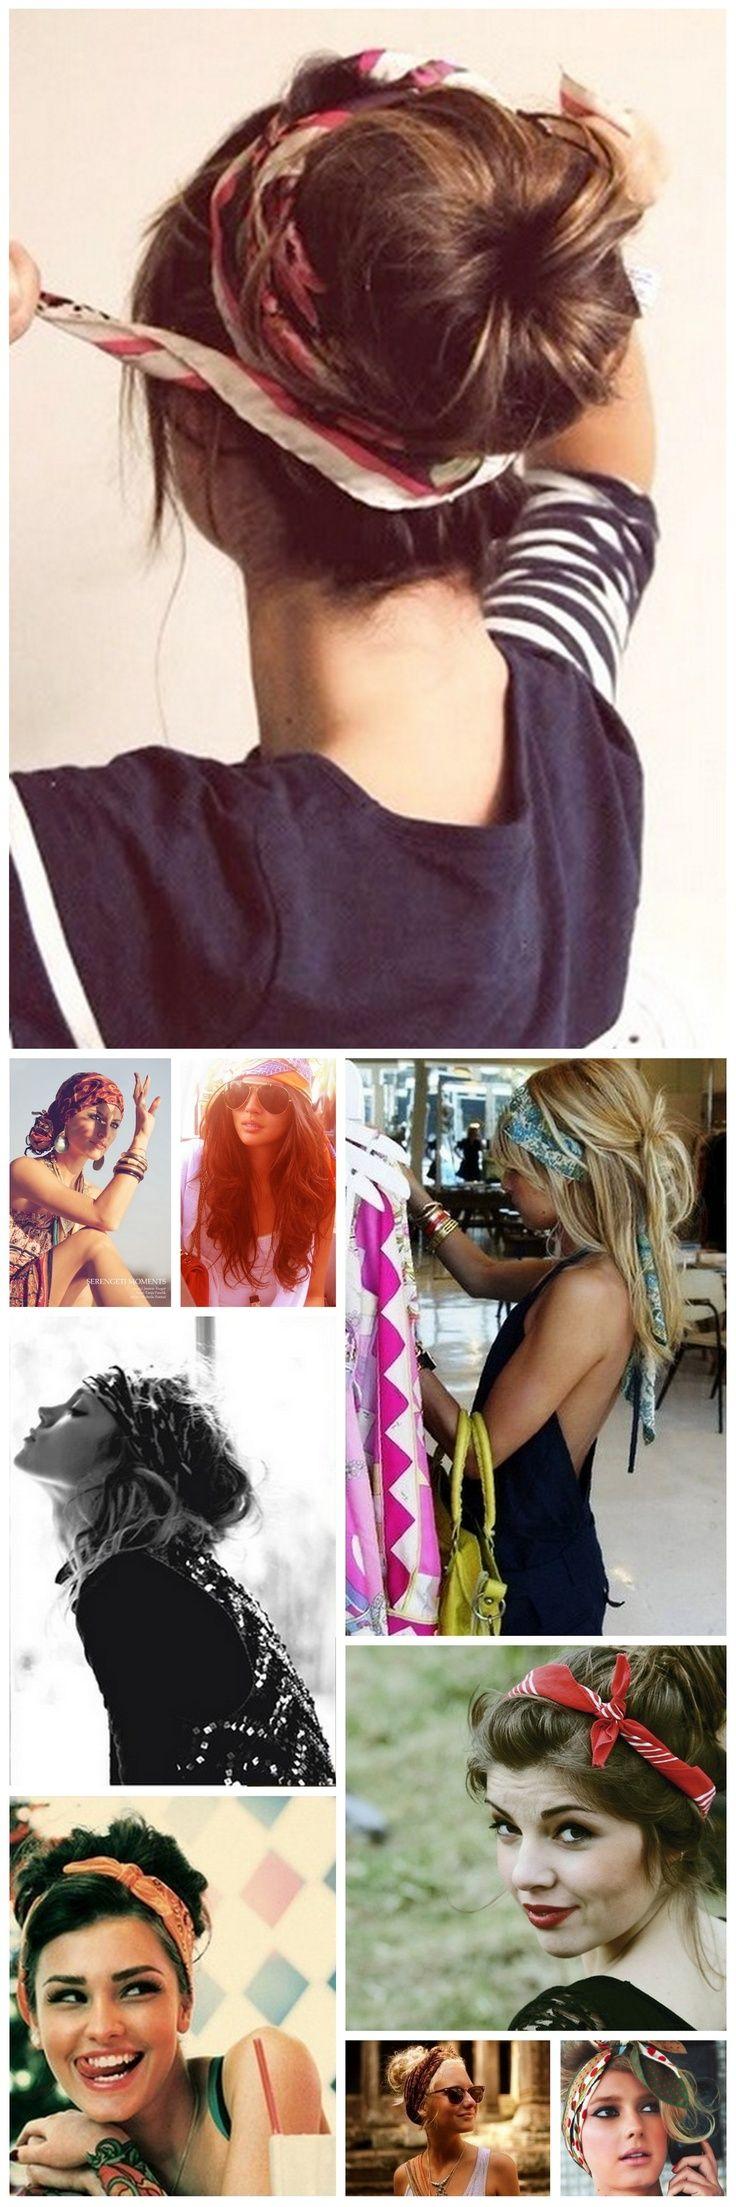 Pin by daria aho on hair pinterest hair style hair makeup and